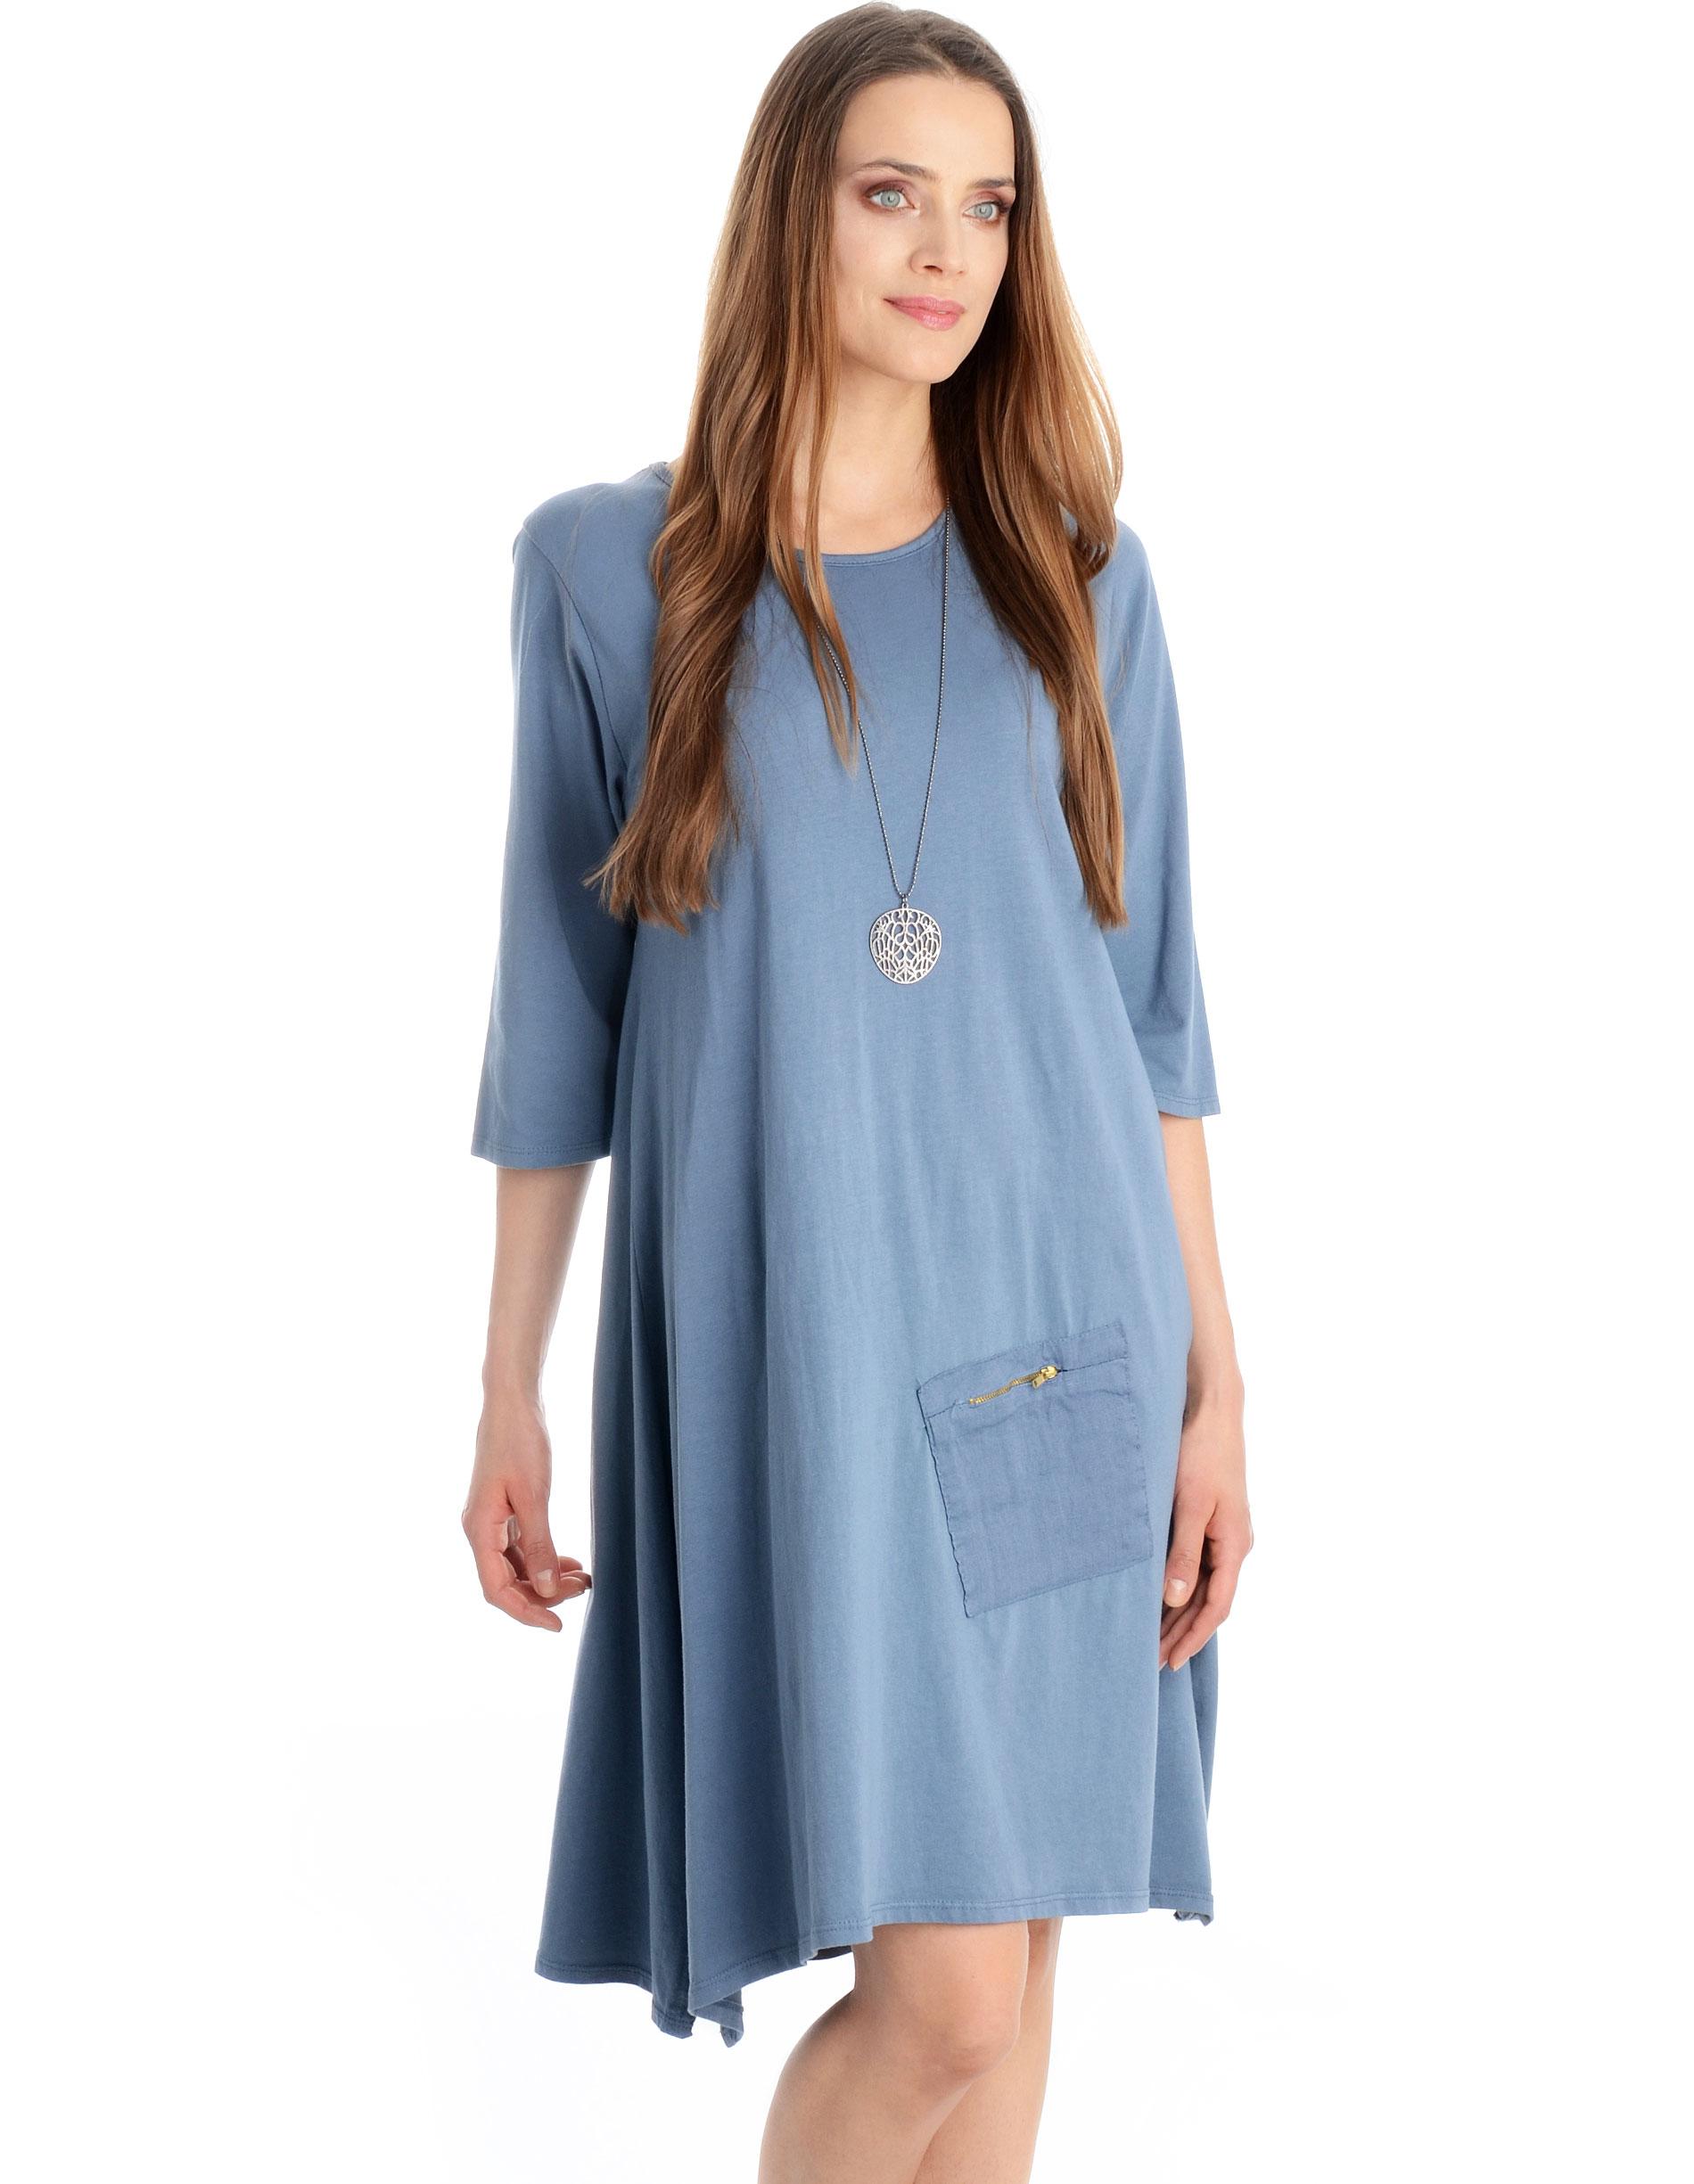 Sukienka - 99-7220 JEANS - Unisono